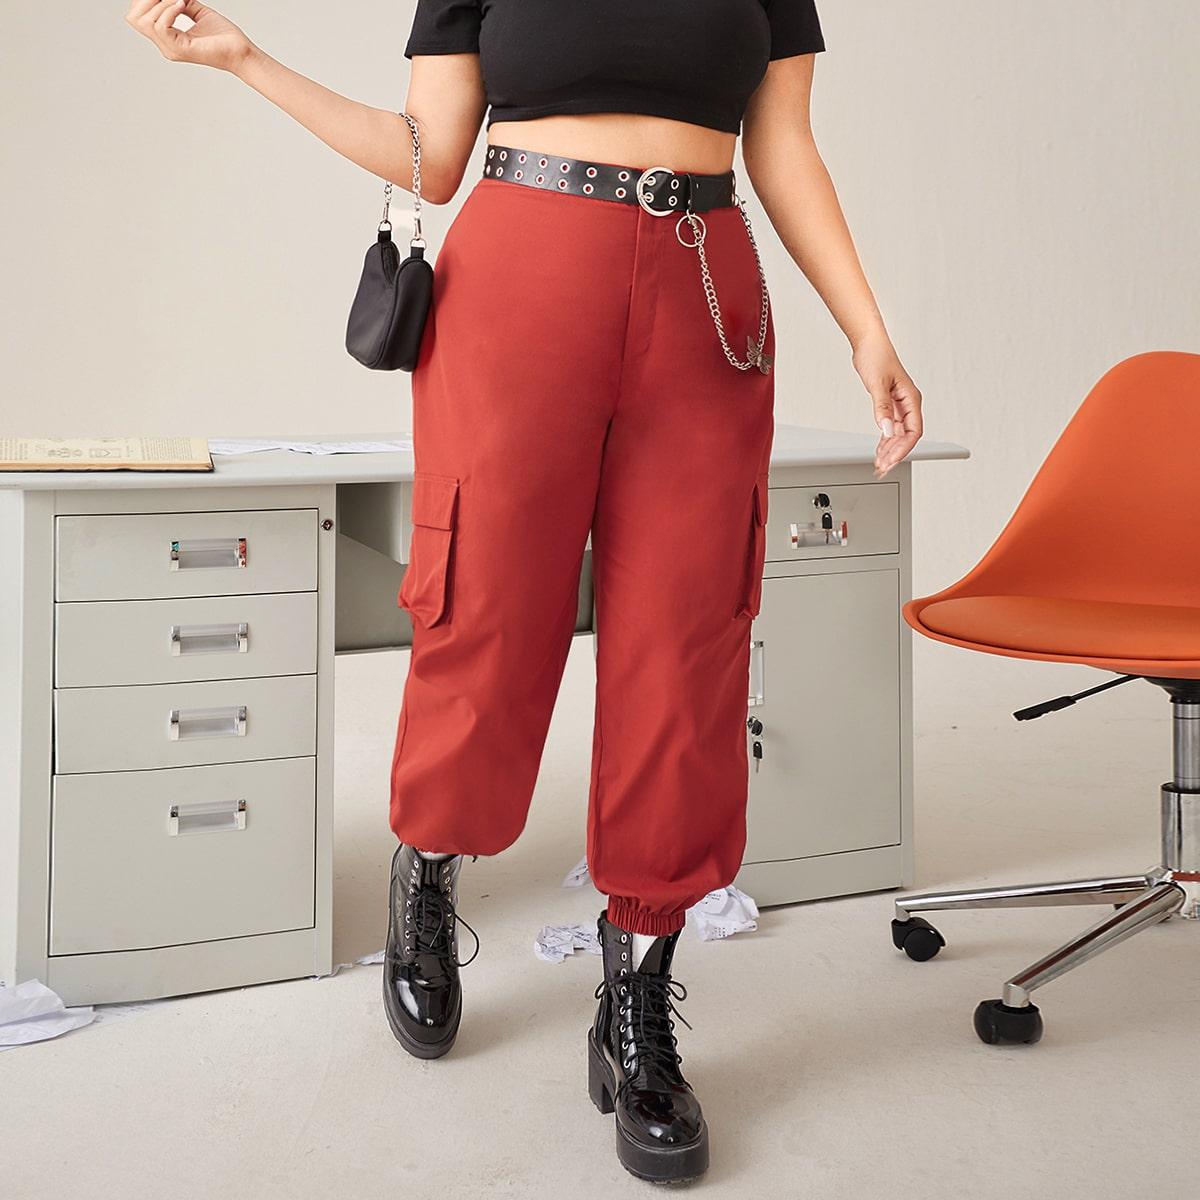 Plus Button Fly Flap Pocket Pants Without Belt